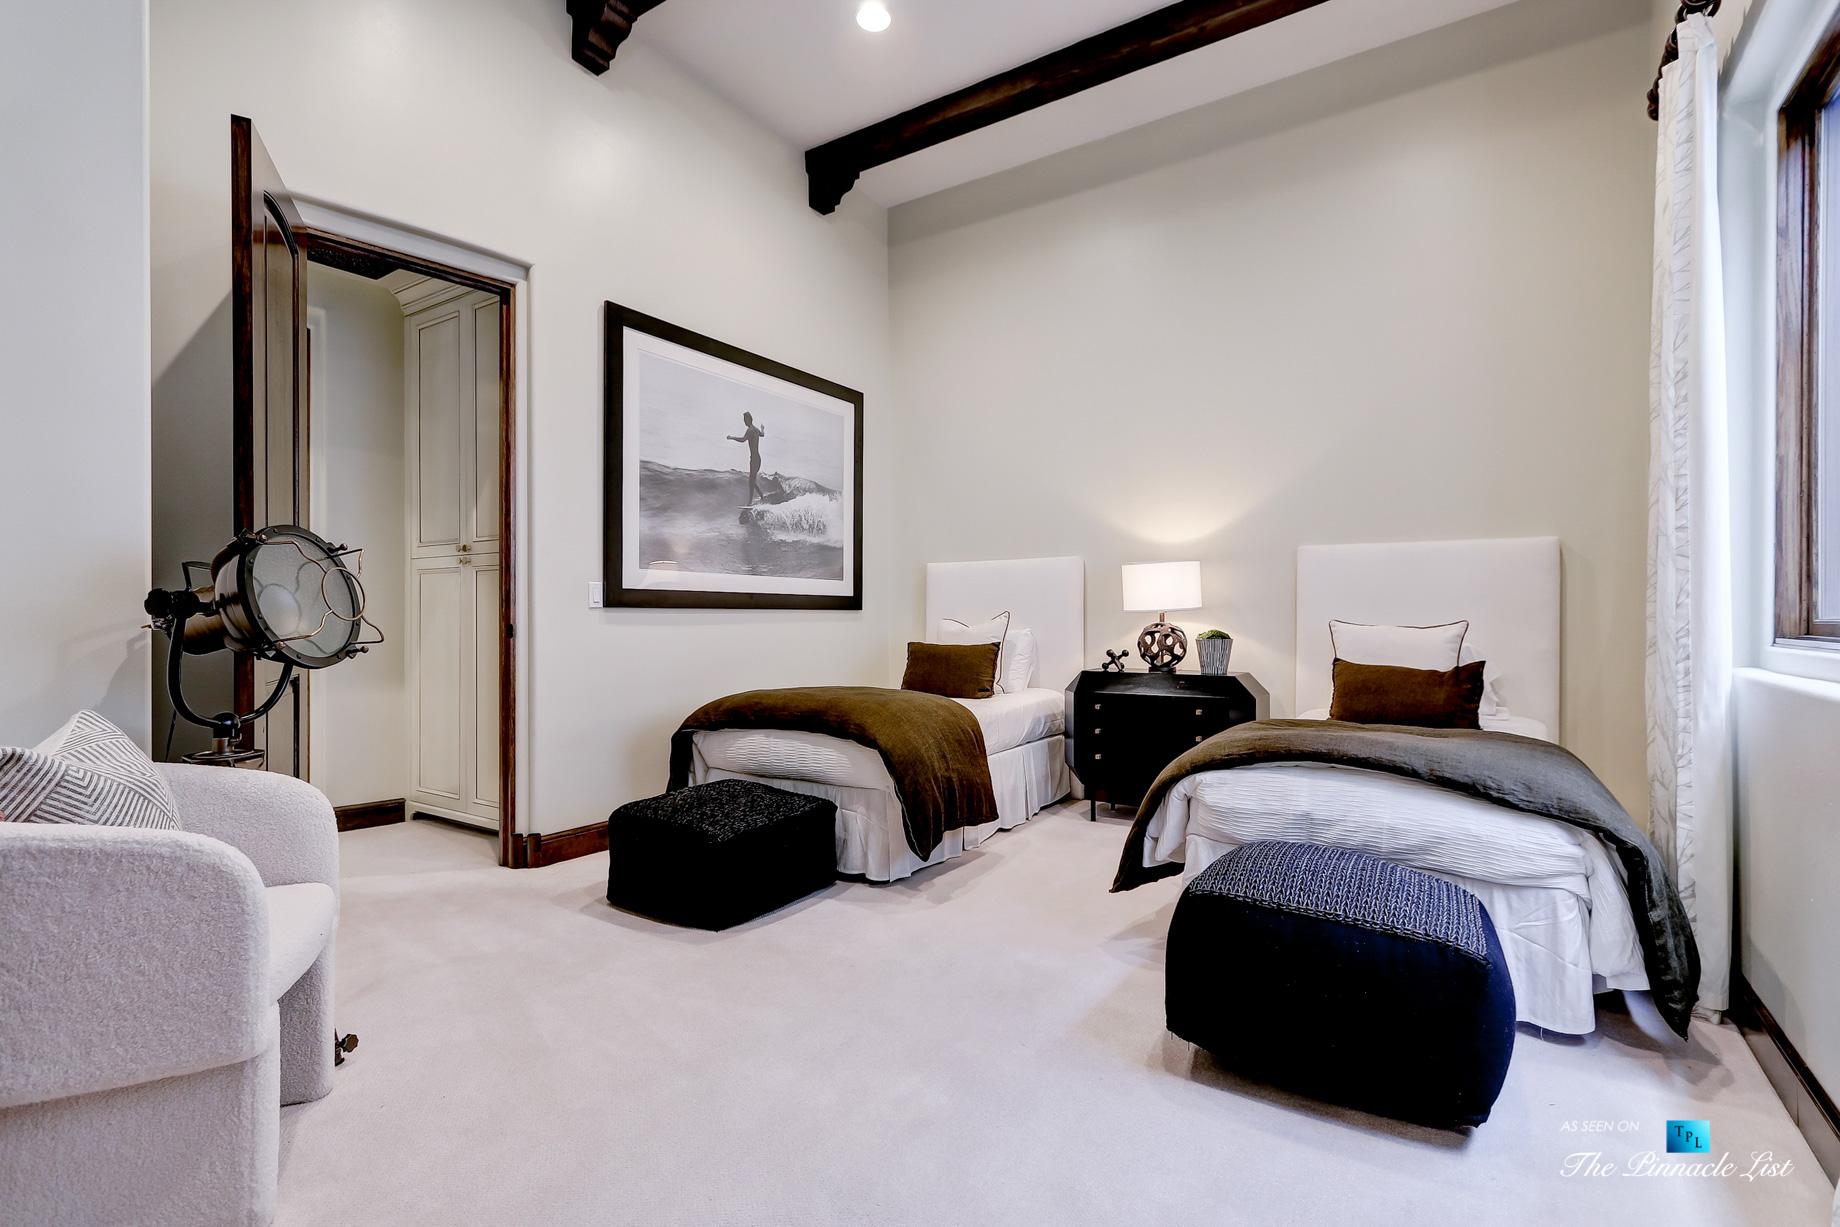 853 10th Street, Manhattan Beach, CA, USA – Bedroom